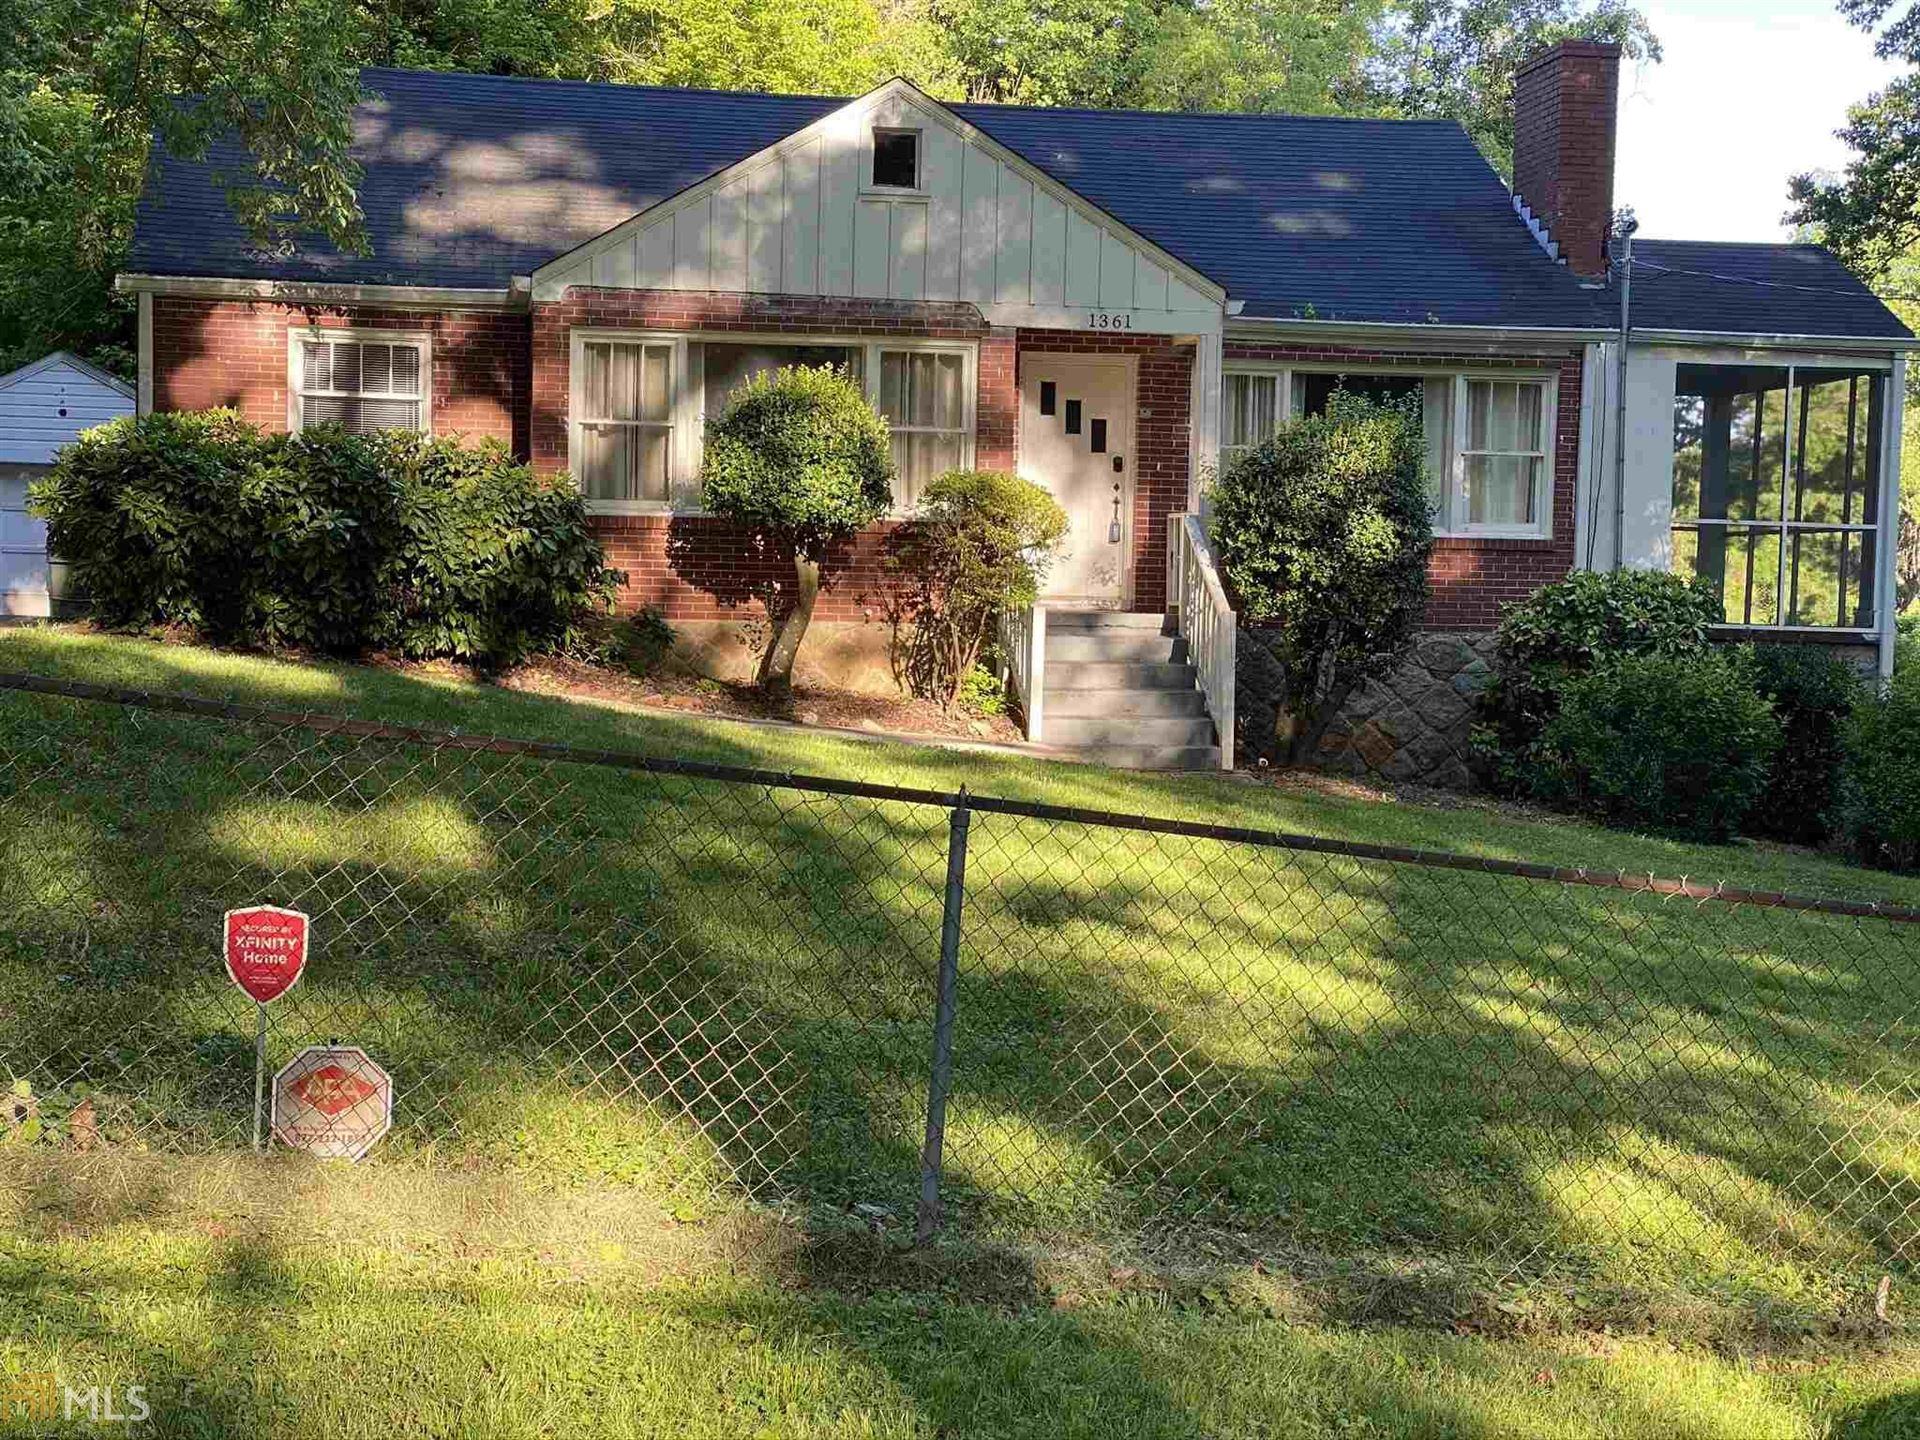 1361 Woodland Ter, Atlanta, GA 30311 - #: 8778049